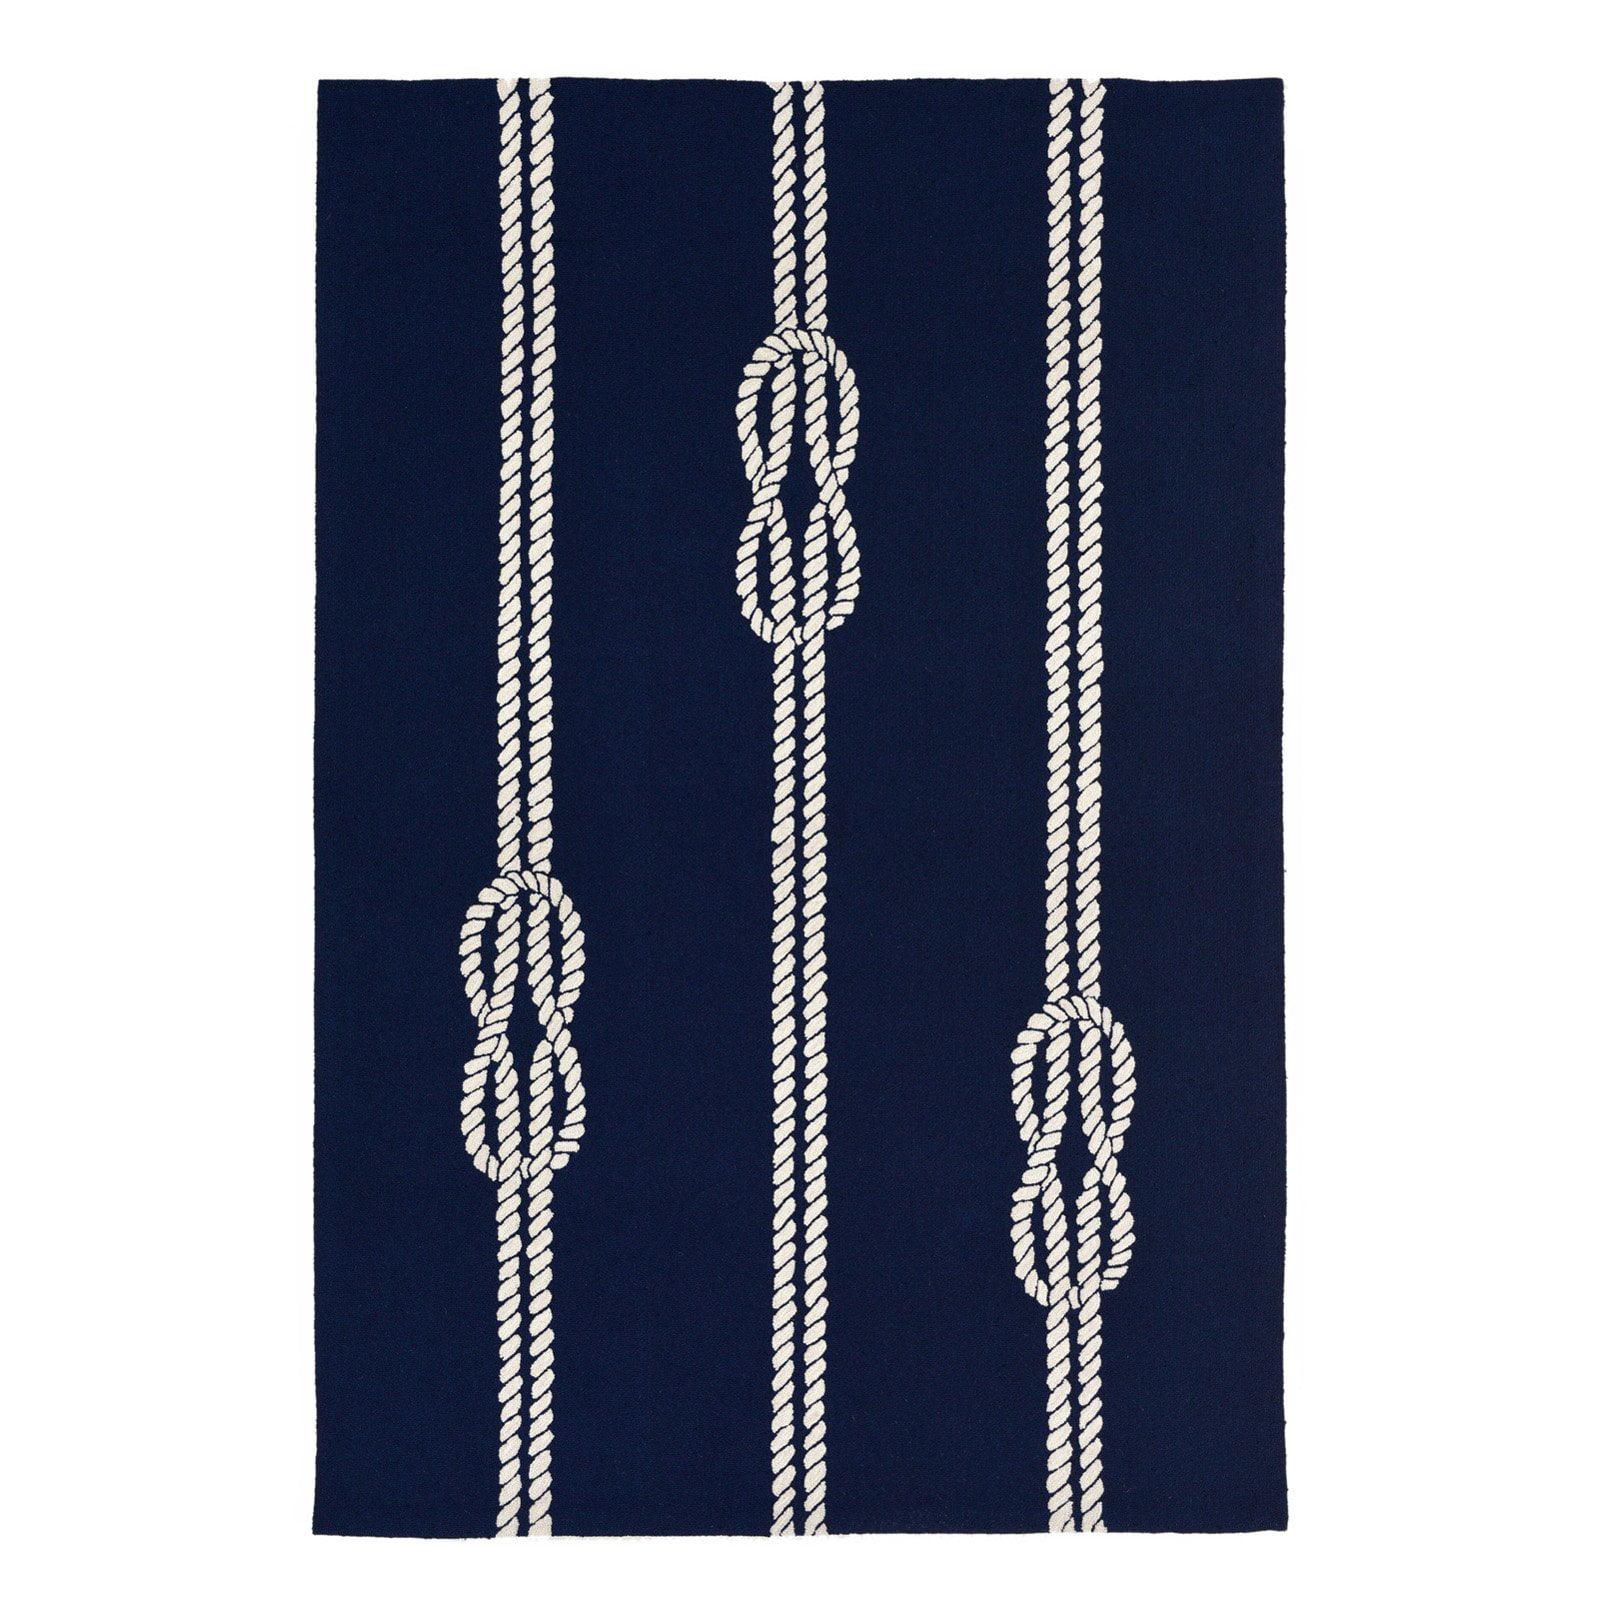 Liora Manne Capri 1636/33 Ropes Navy Area Rug